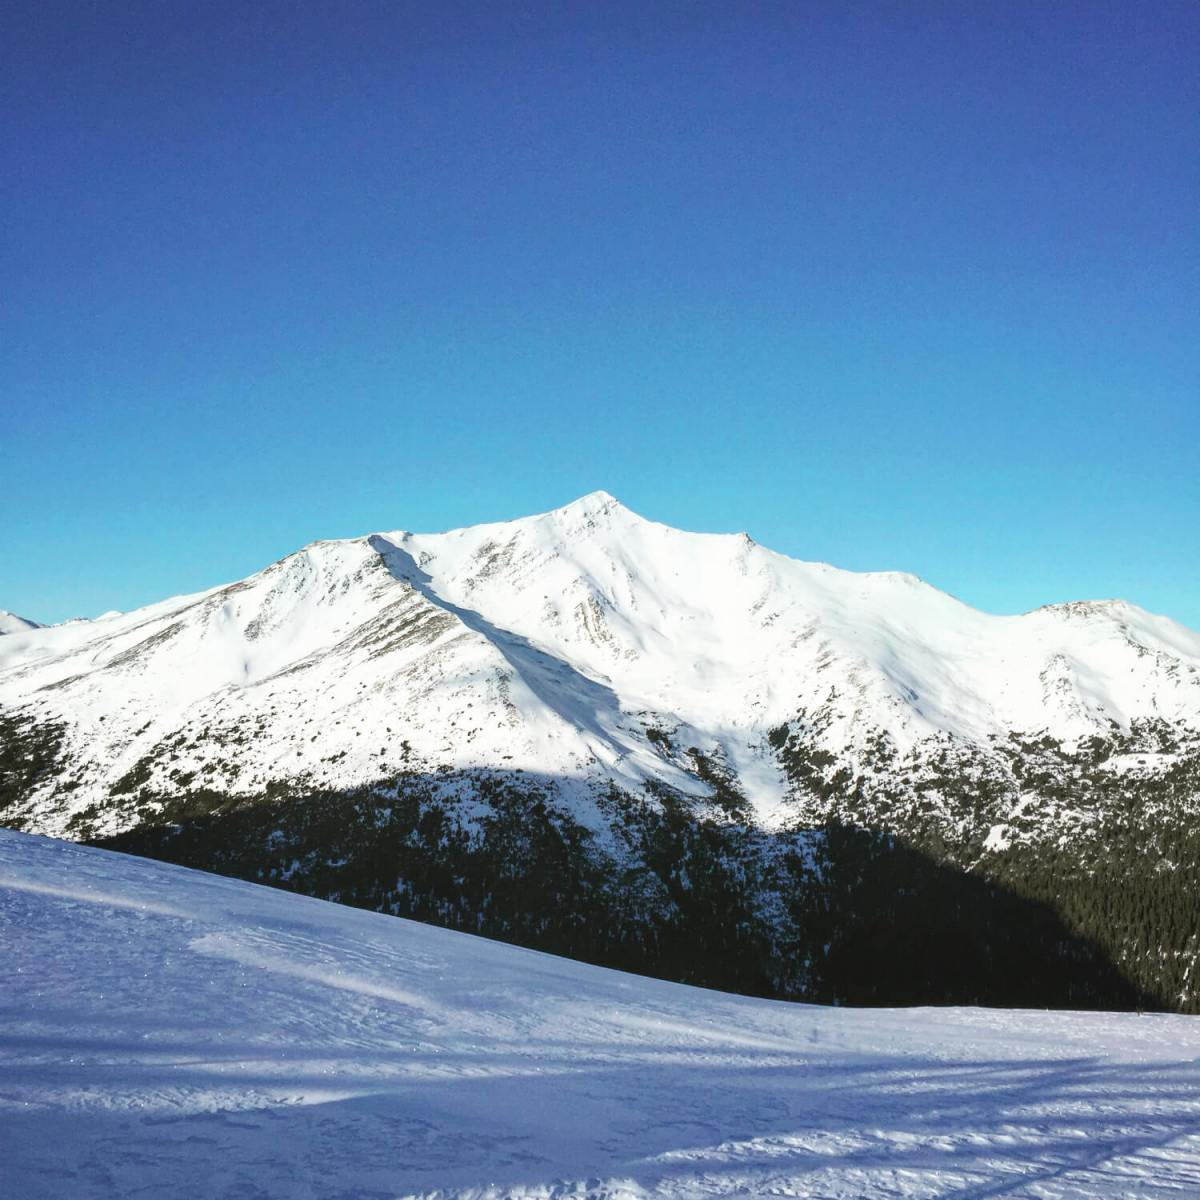 Recap: Weekend getaway to Jasper in January + Enter to Win Lift Passes to Marmot Basin!